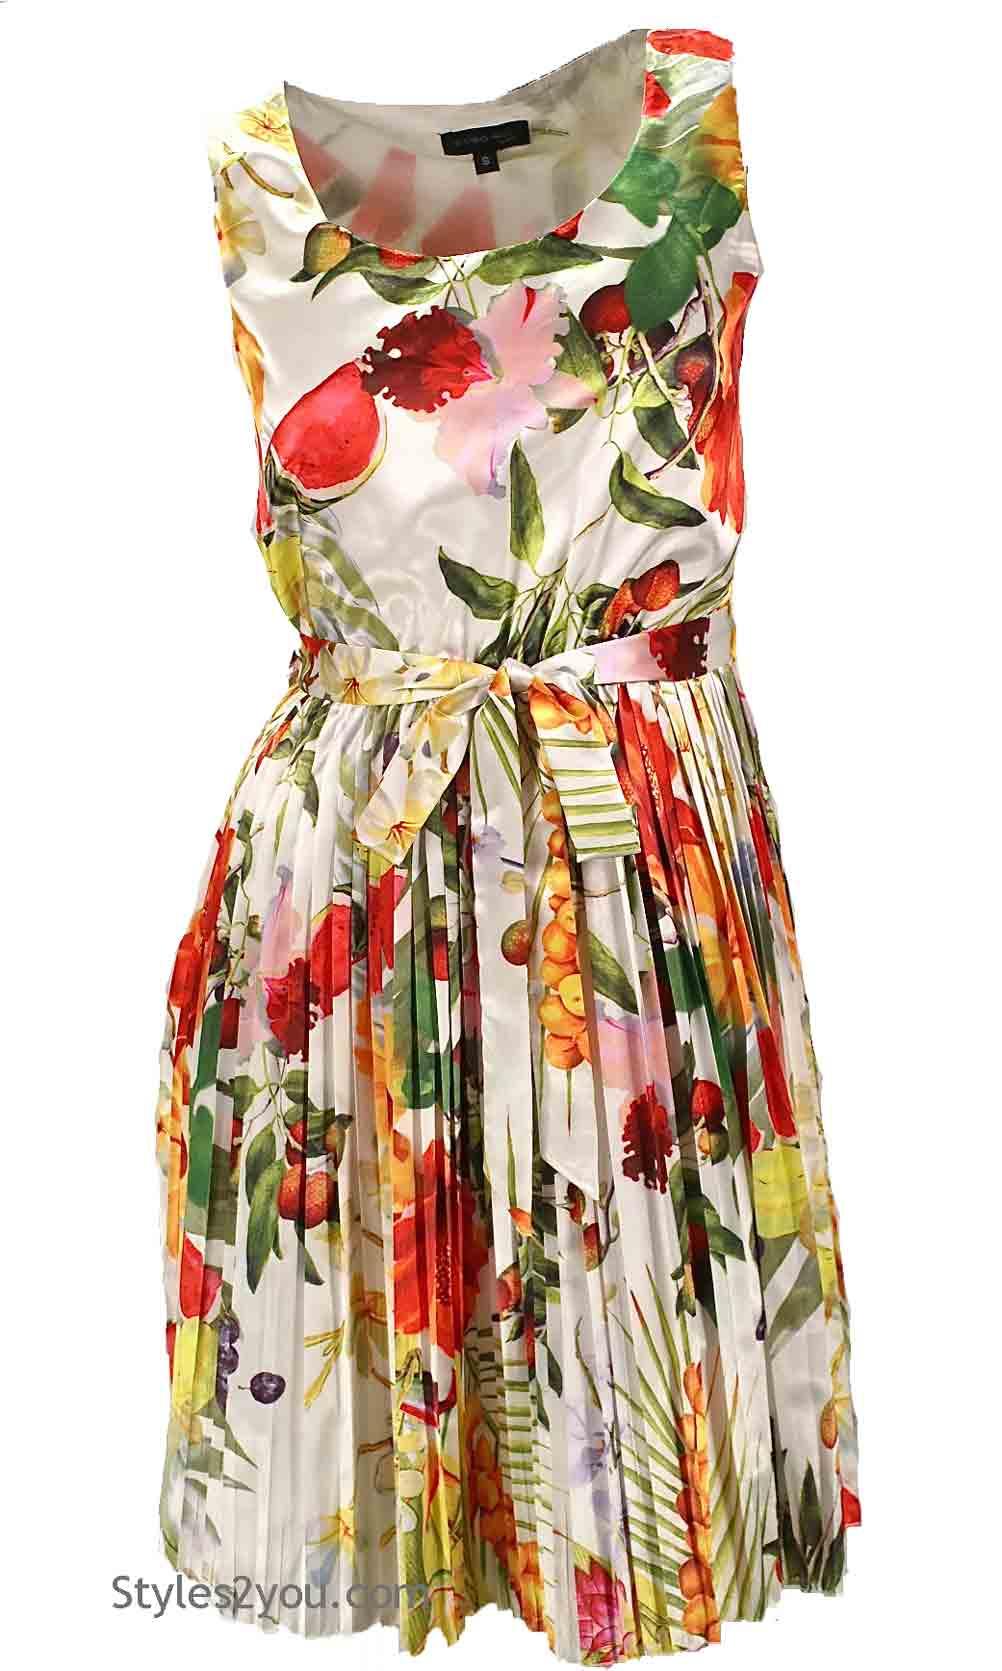 Nitty Sleeveless Como No Ladies Retro Dress In Fun Colors